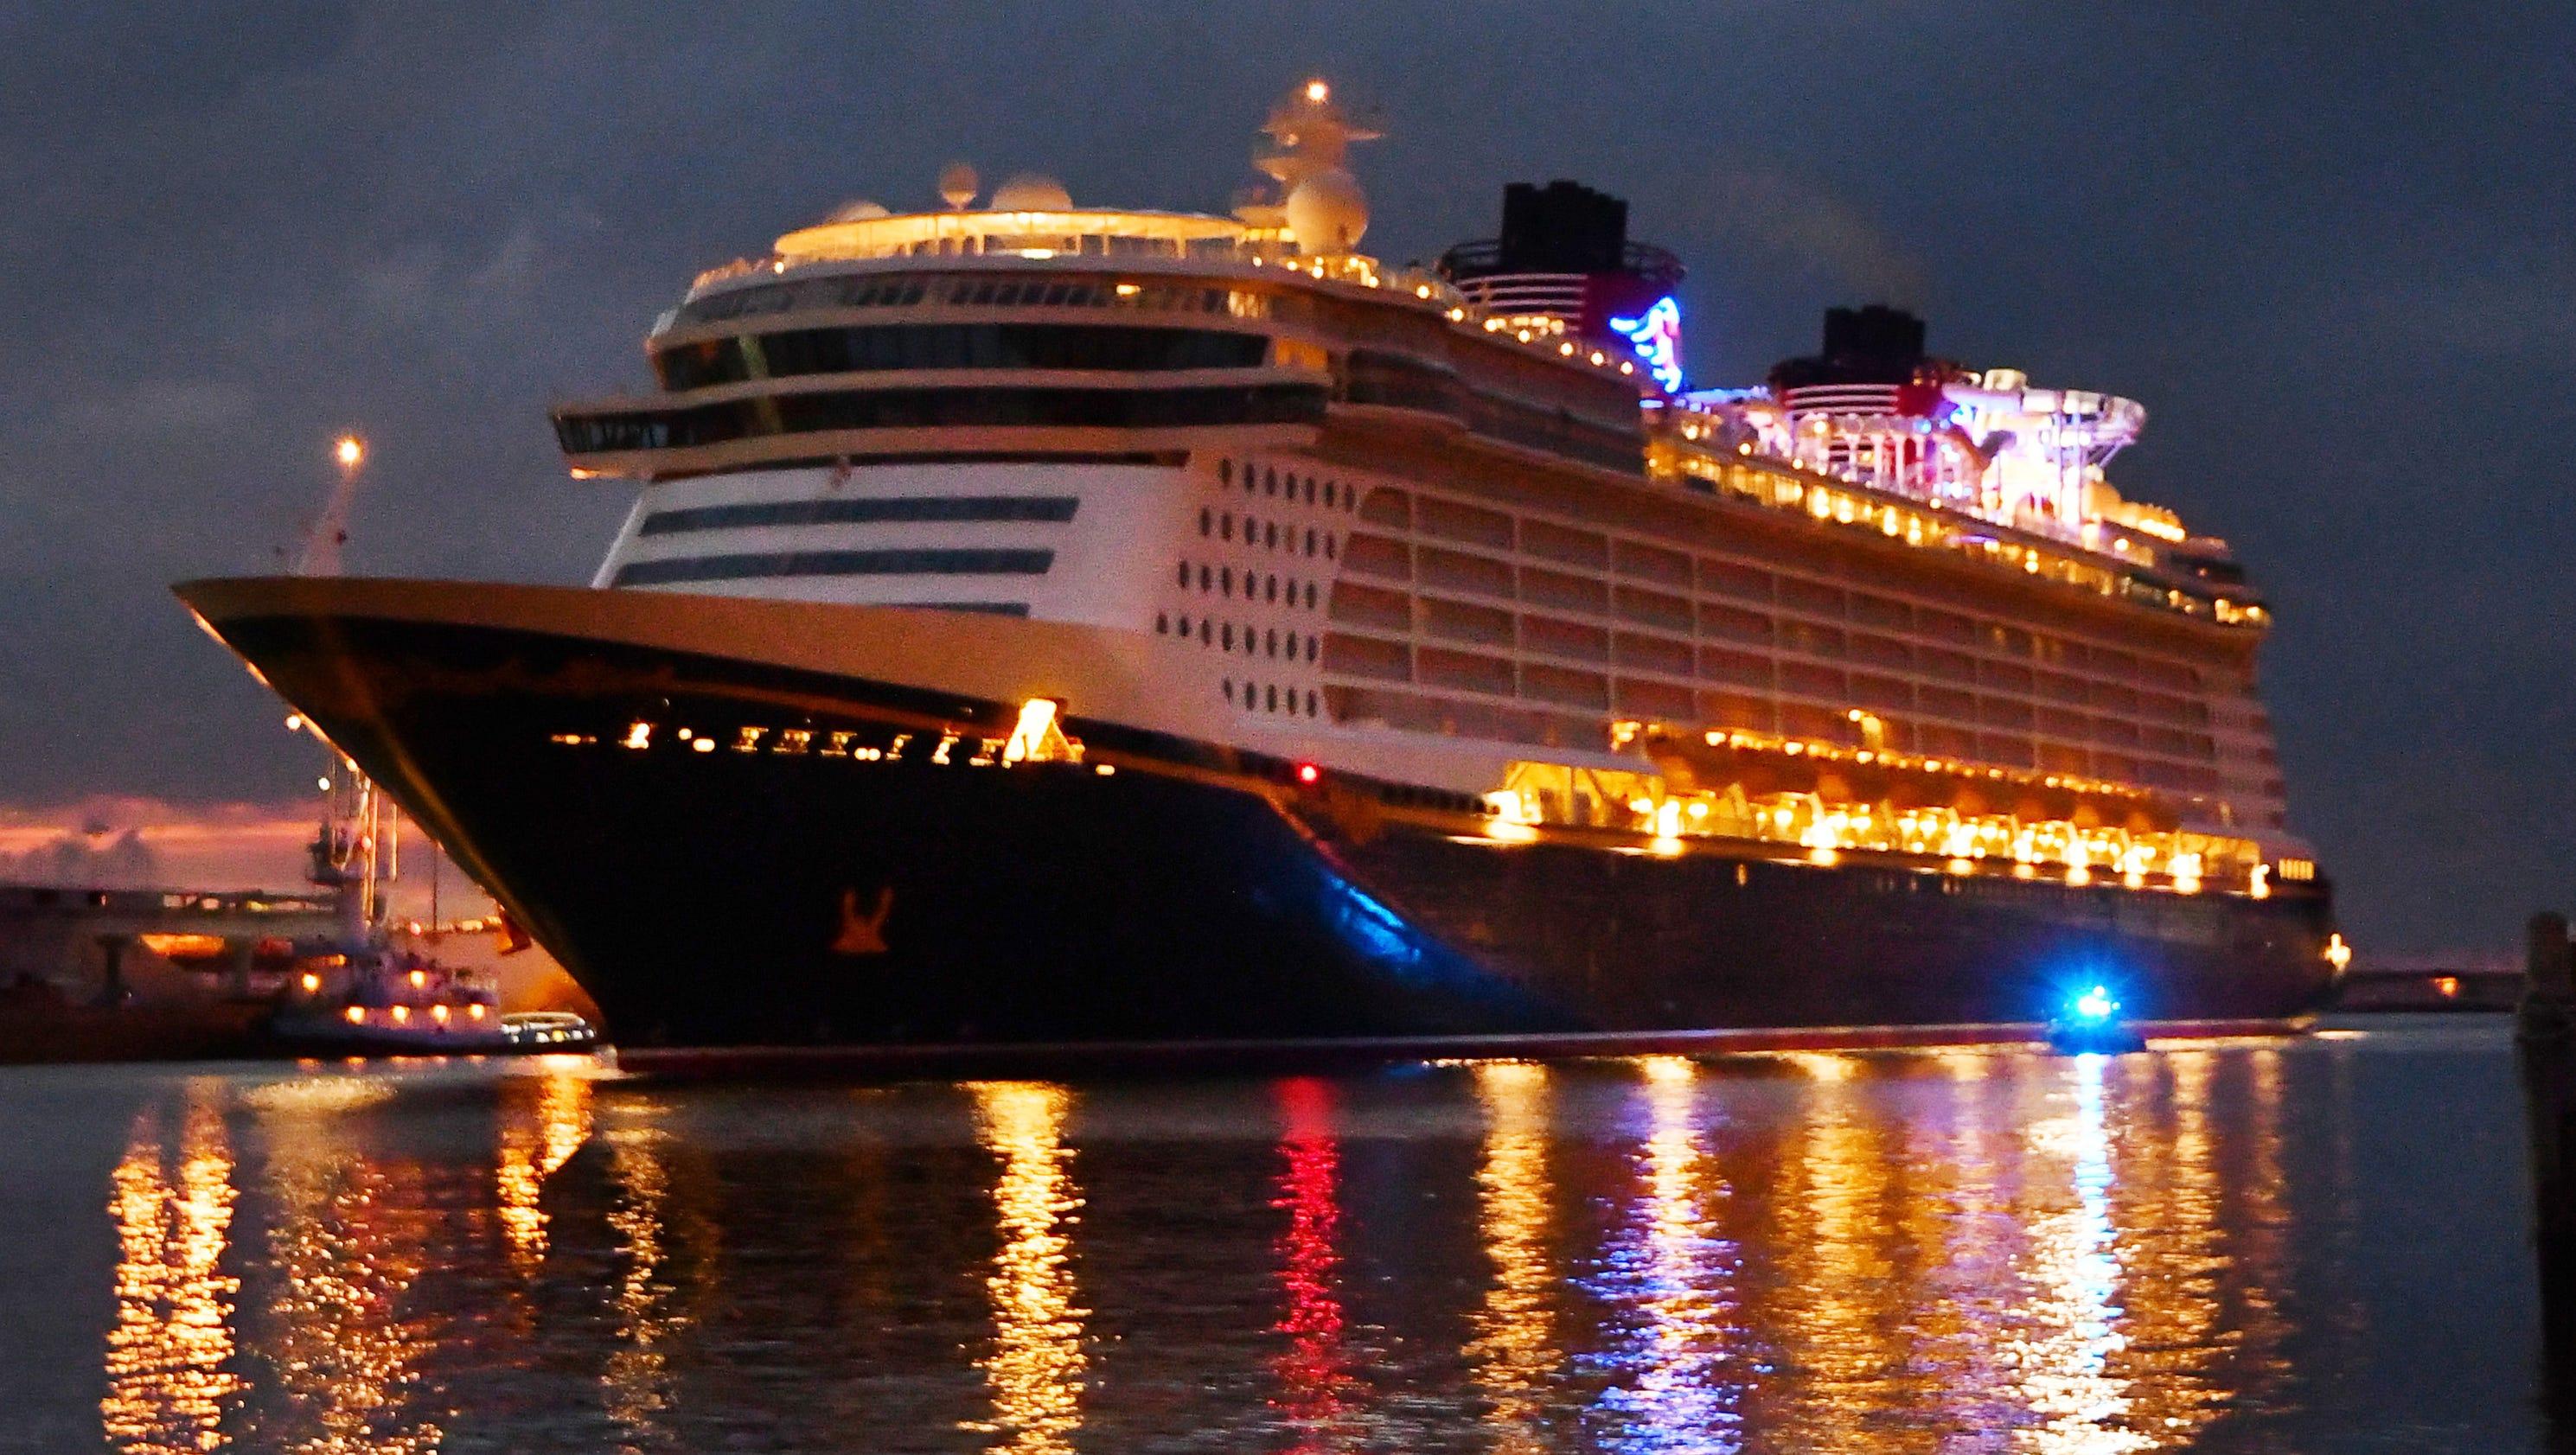 disney cruise 2019 schedule - HD3200×1680